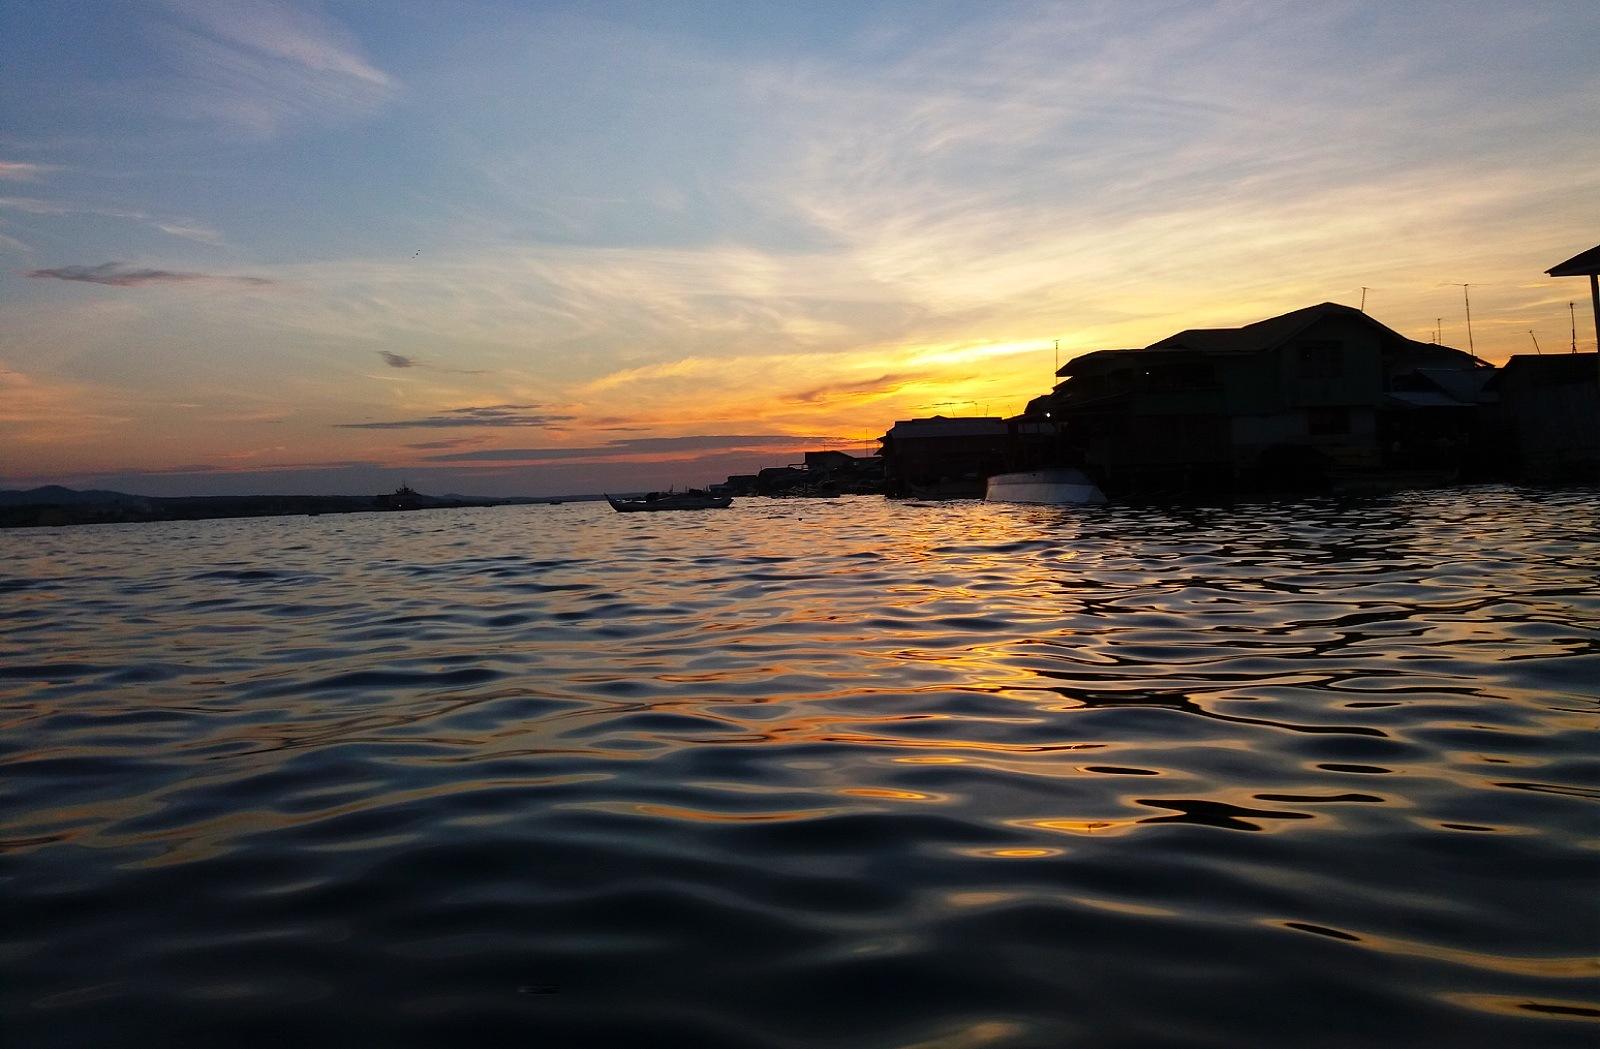 Malamawi Island Sunset by kylenique